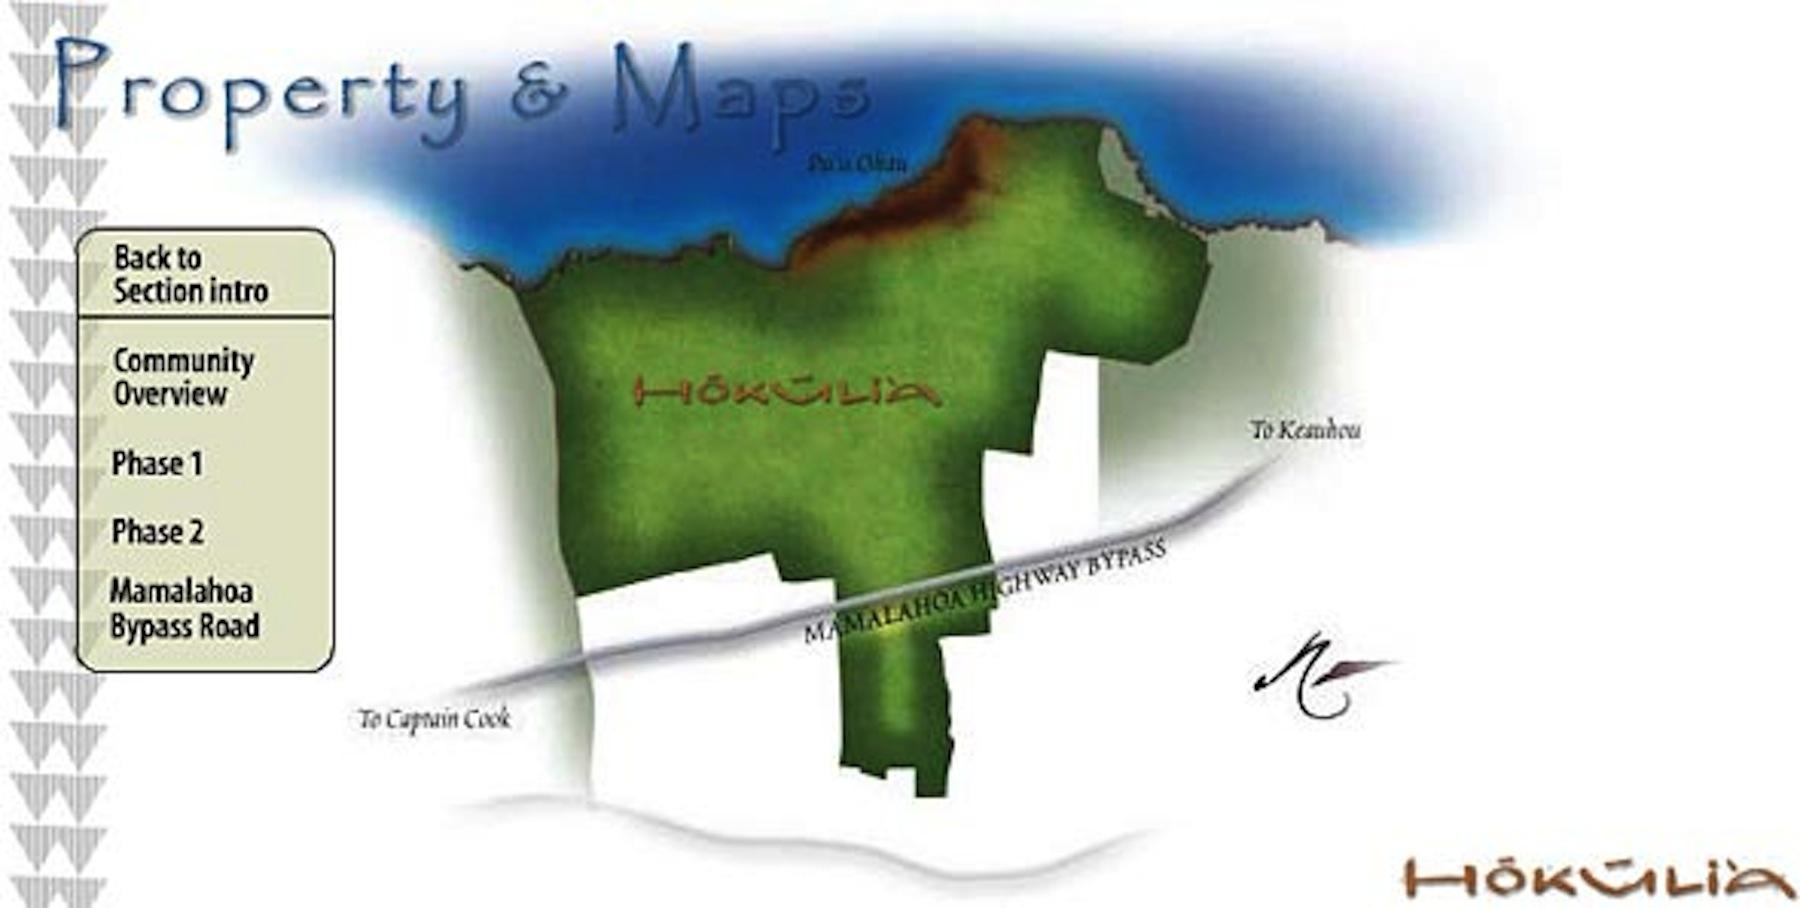 2 Hokuli'a - Property and Maps